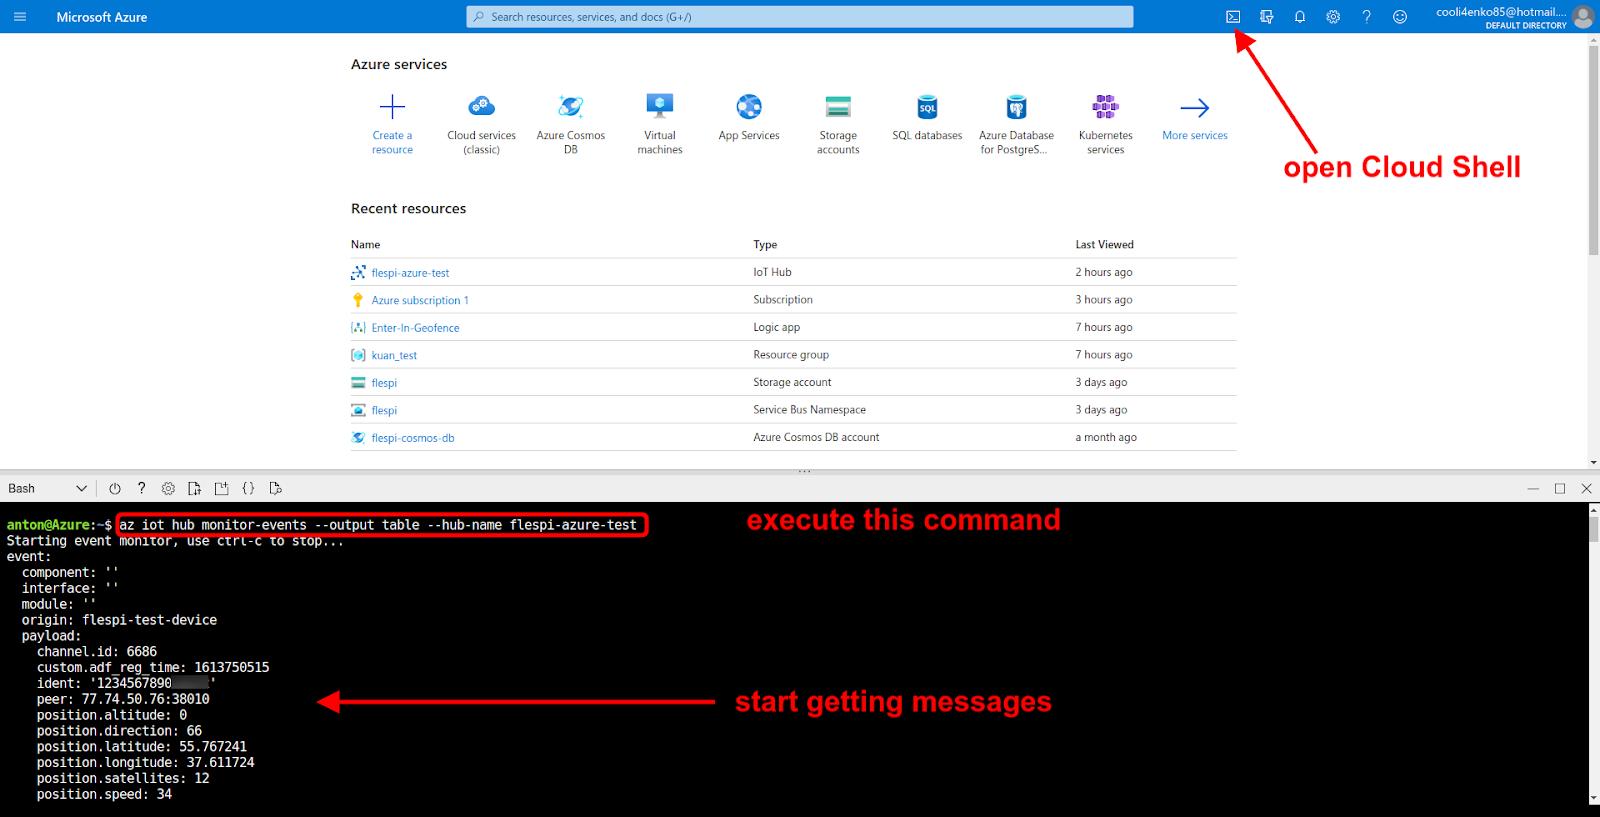 azure cloud shell hub monitor events command